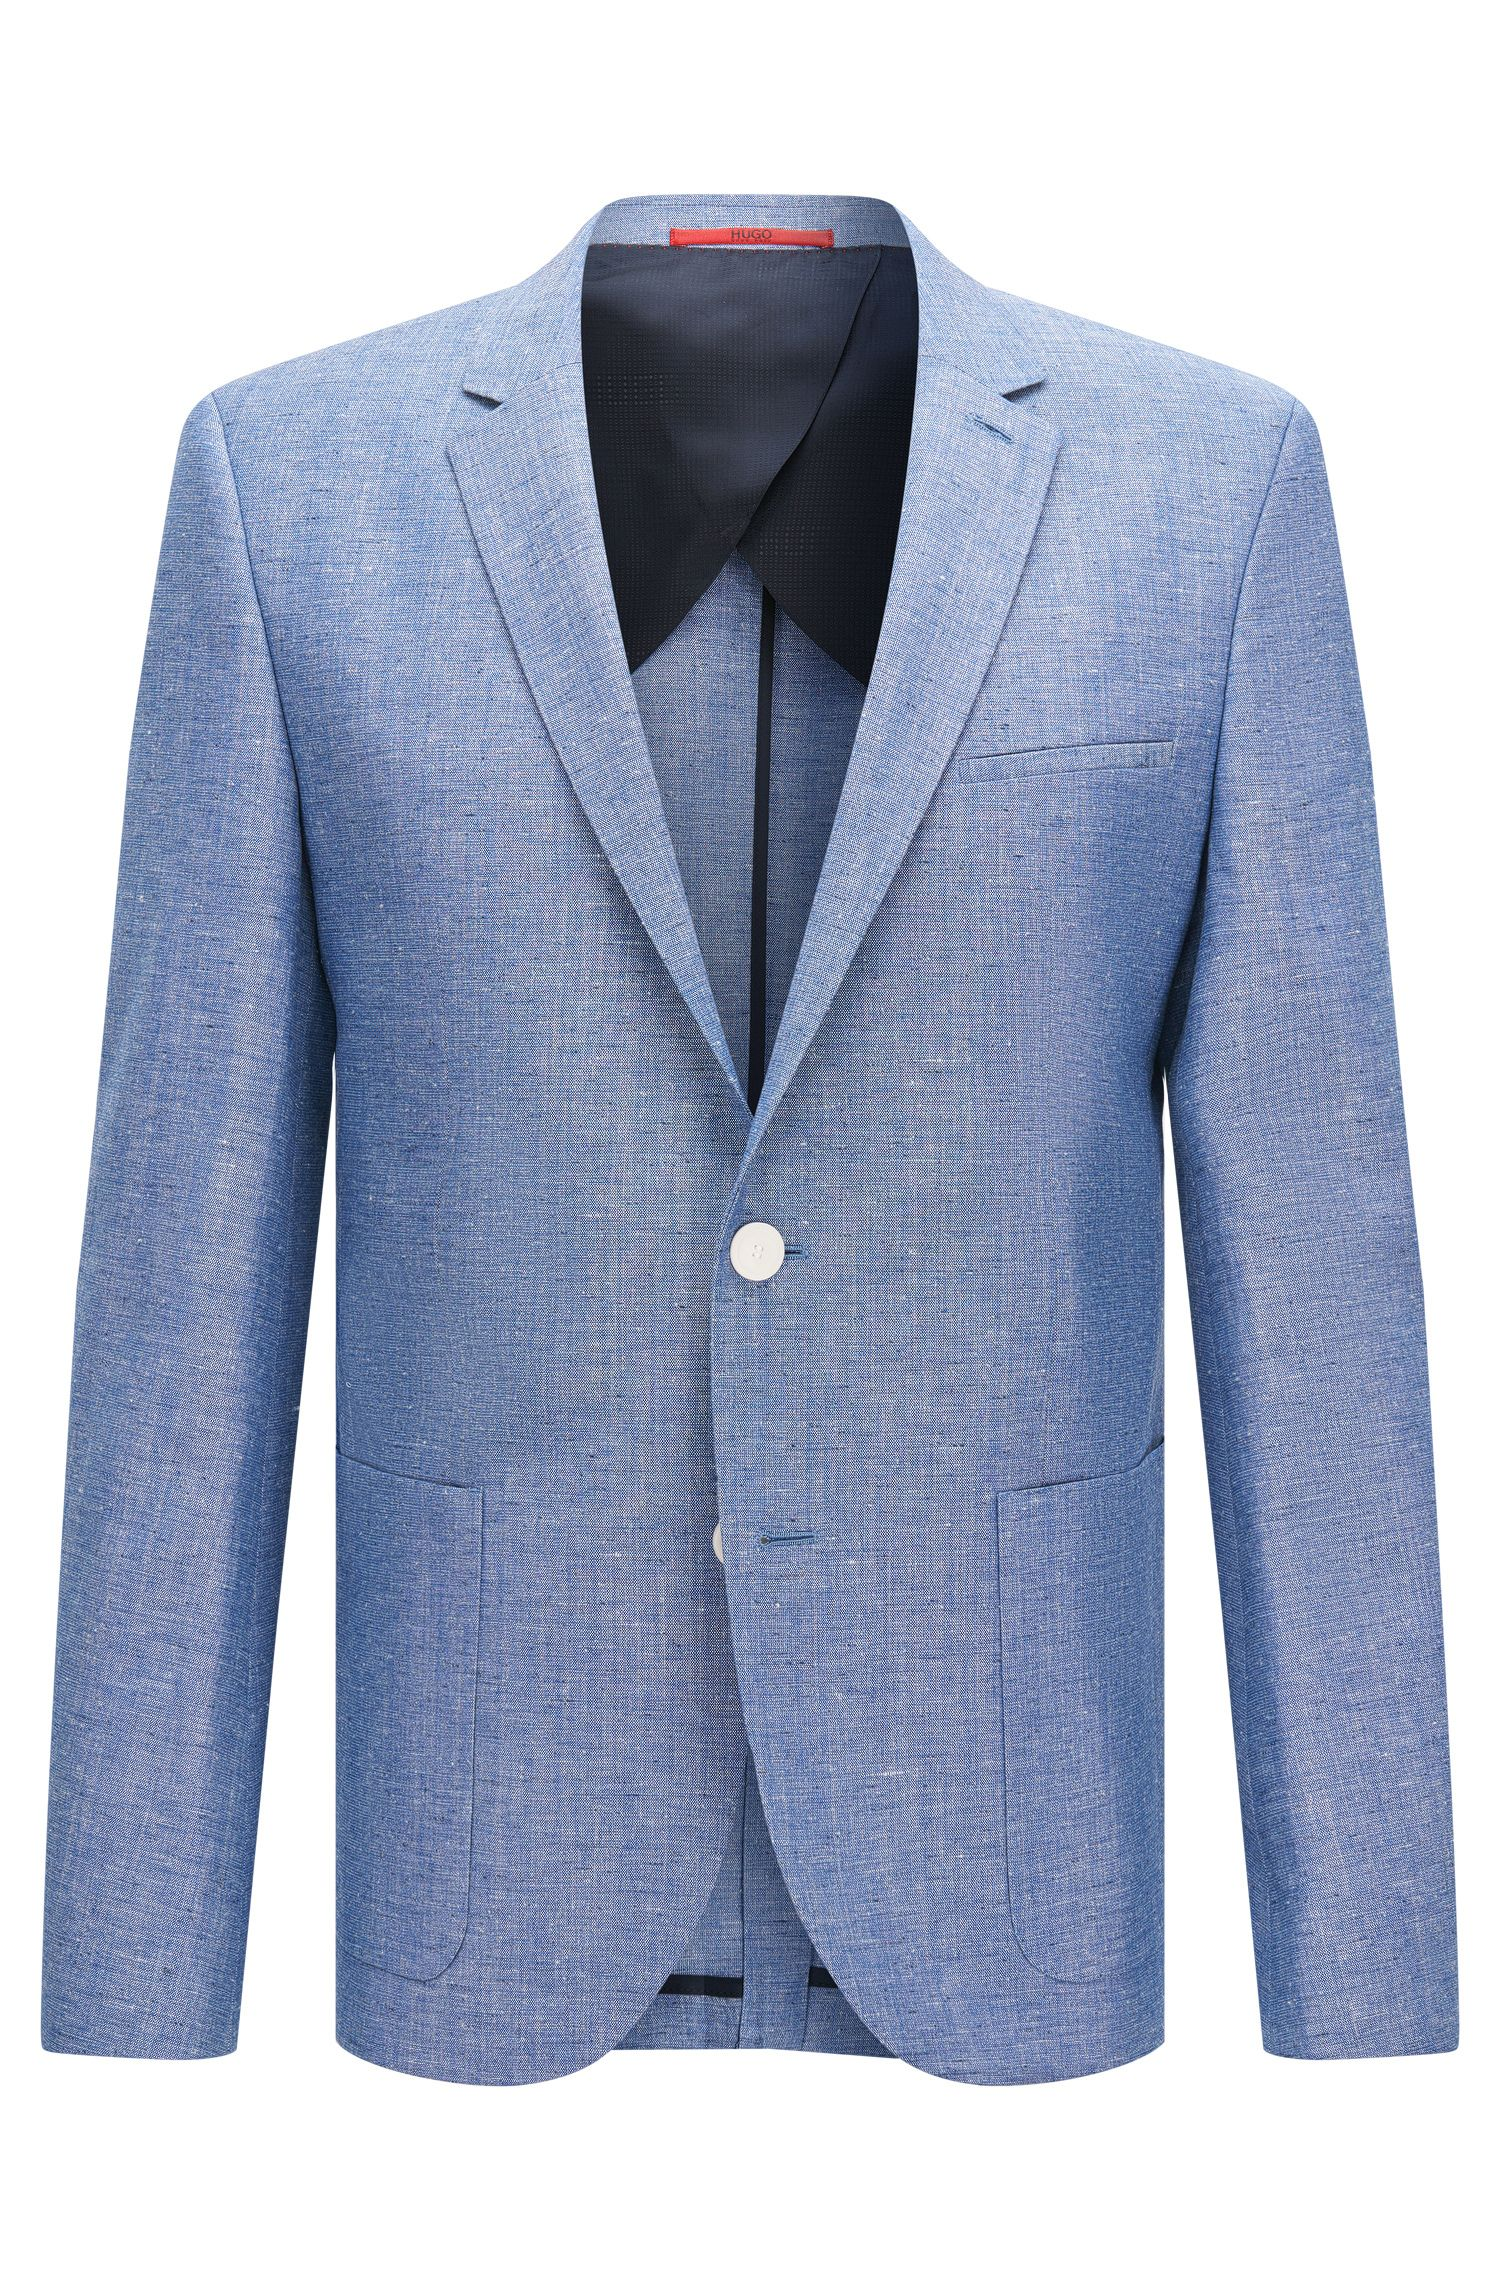 Wool Silk Linen Blend Donegal Sport Coat, Slim Fit | Antano